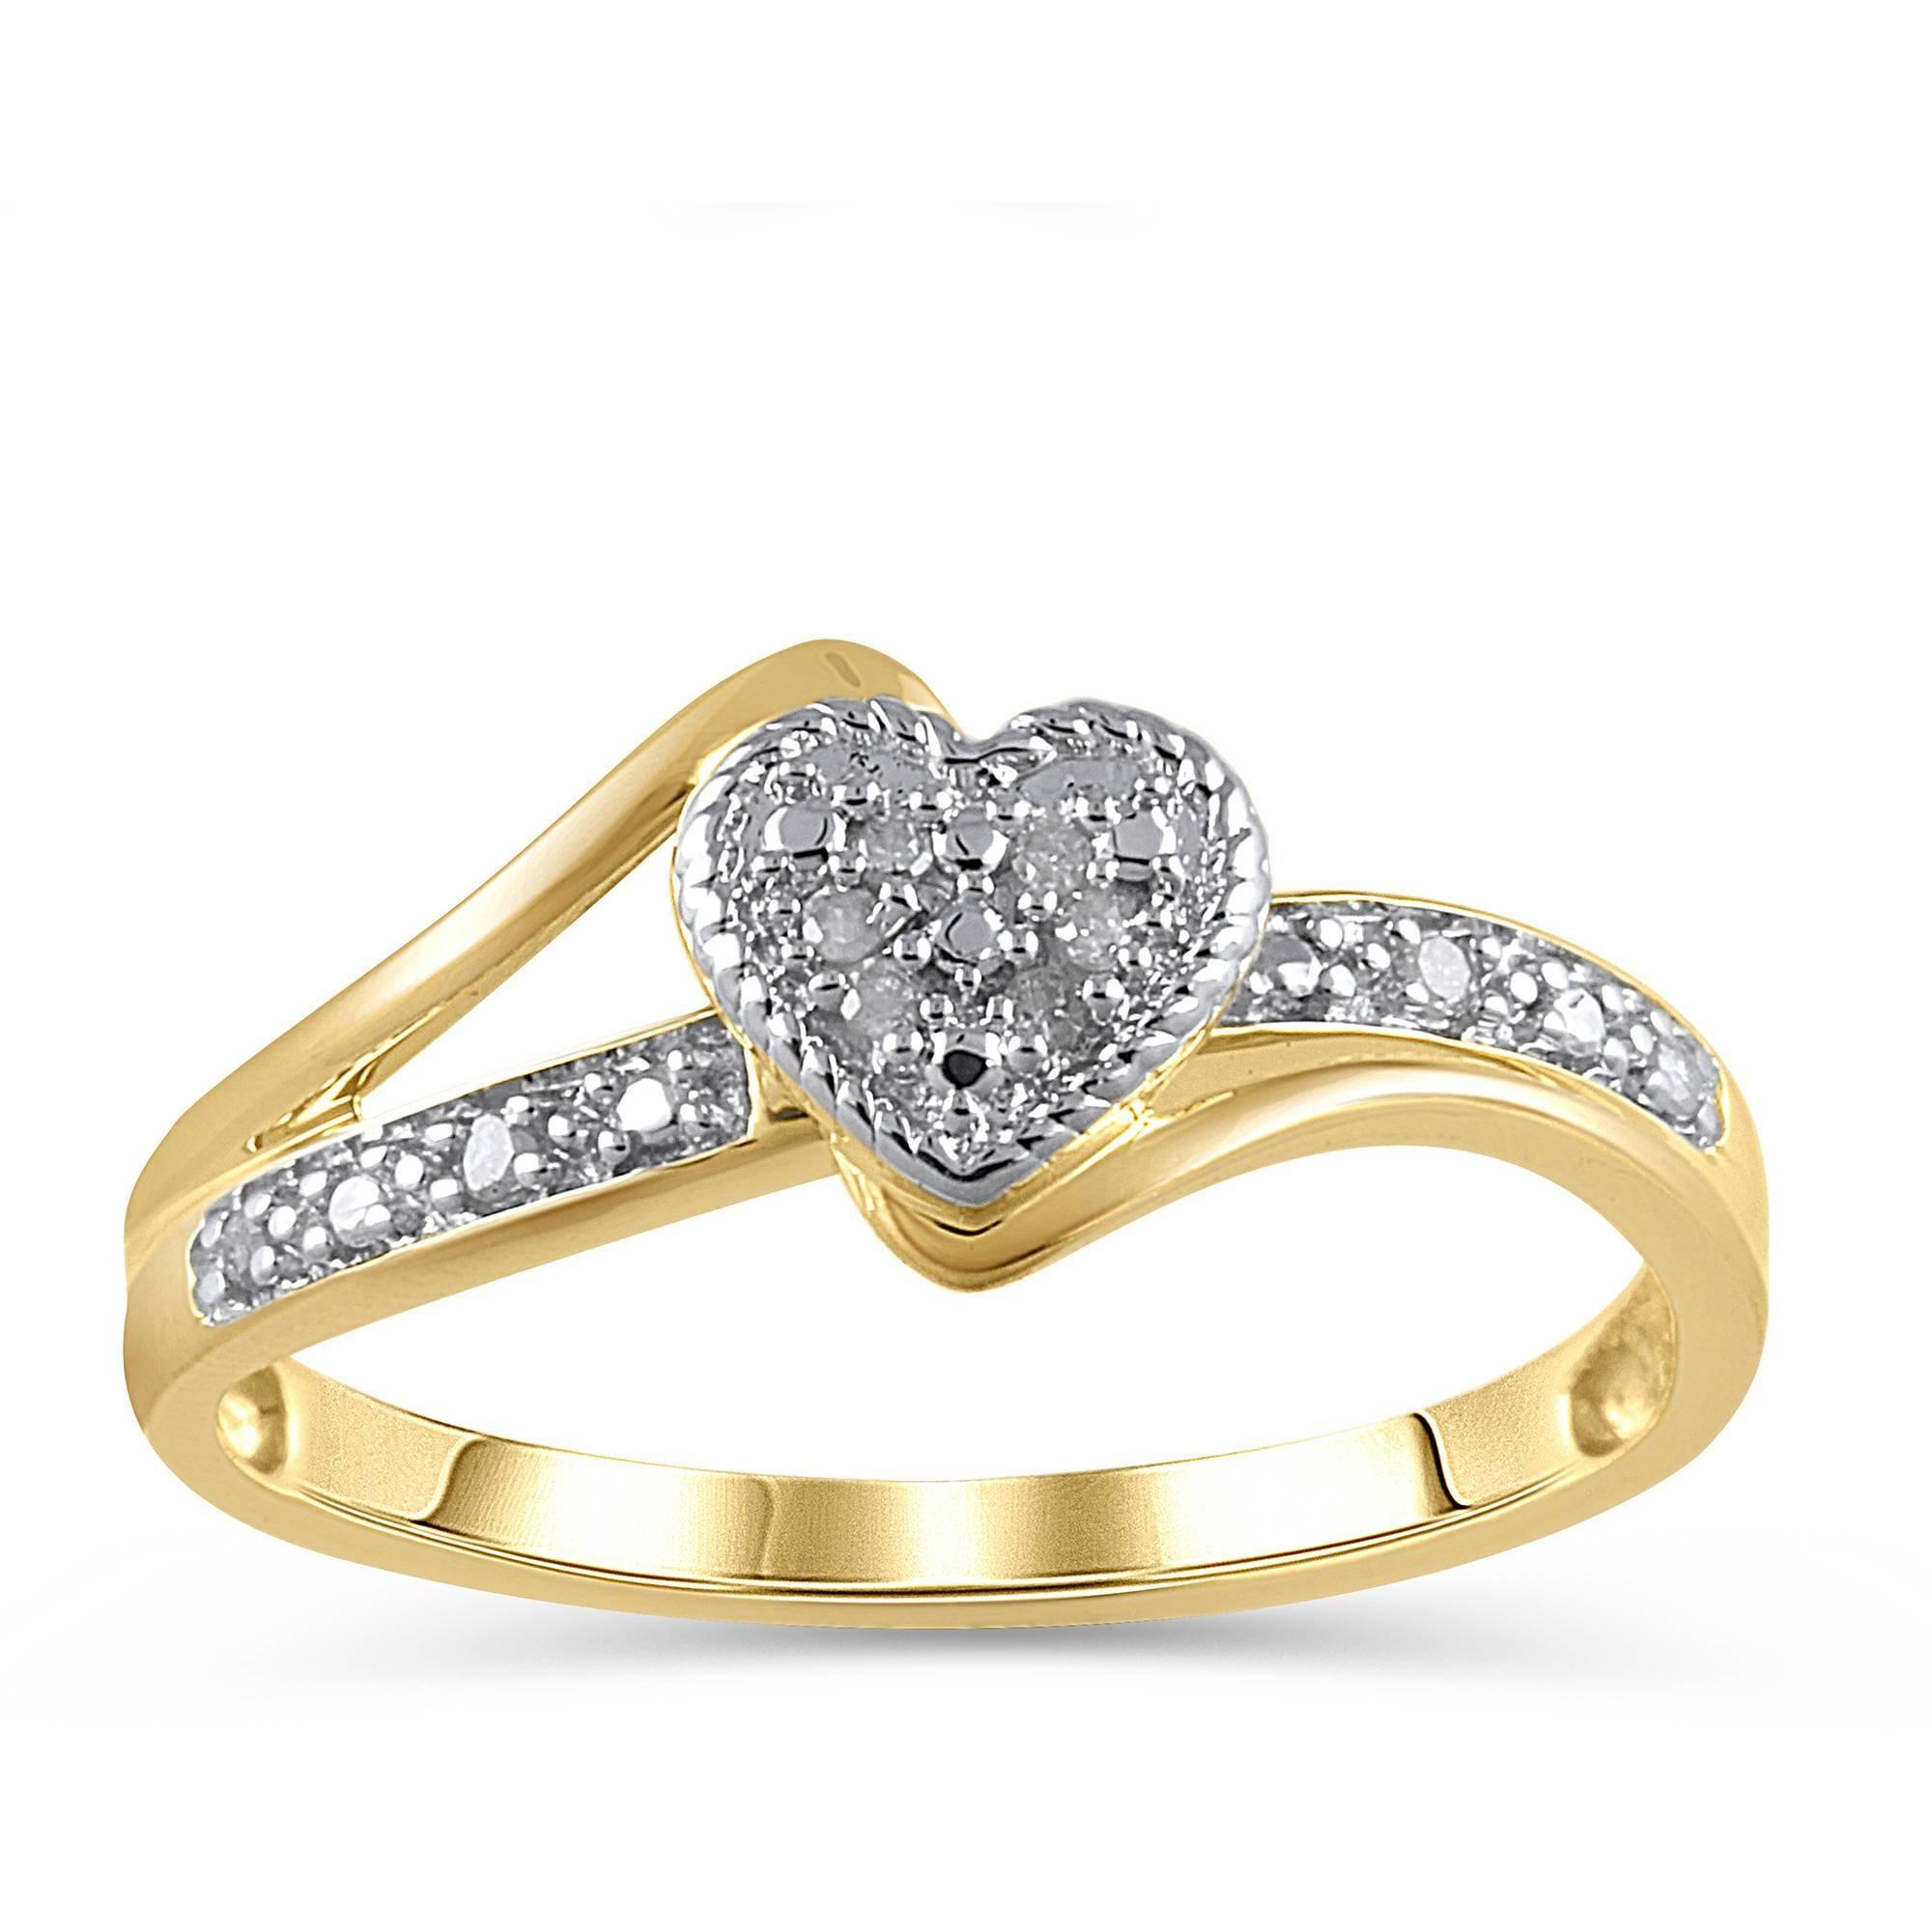 Wedding Rings : Mens Wedding Rings Wonderful Wedding Rings Walmart Intended For Walmart Wedding Rings For Women (View 14 of 15)